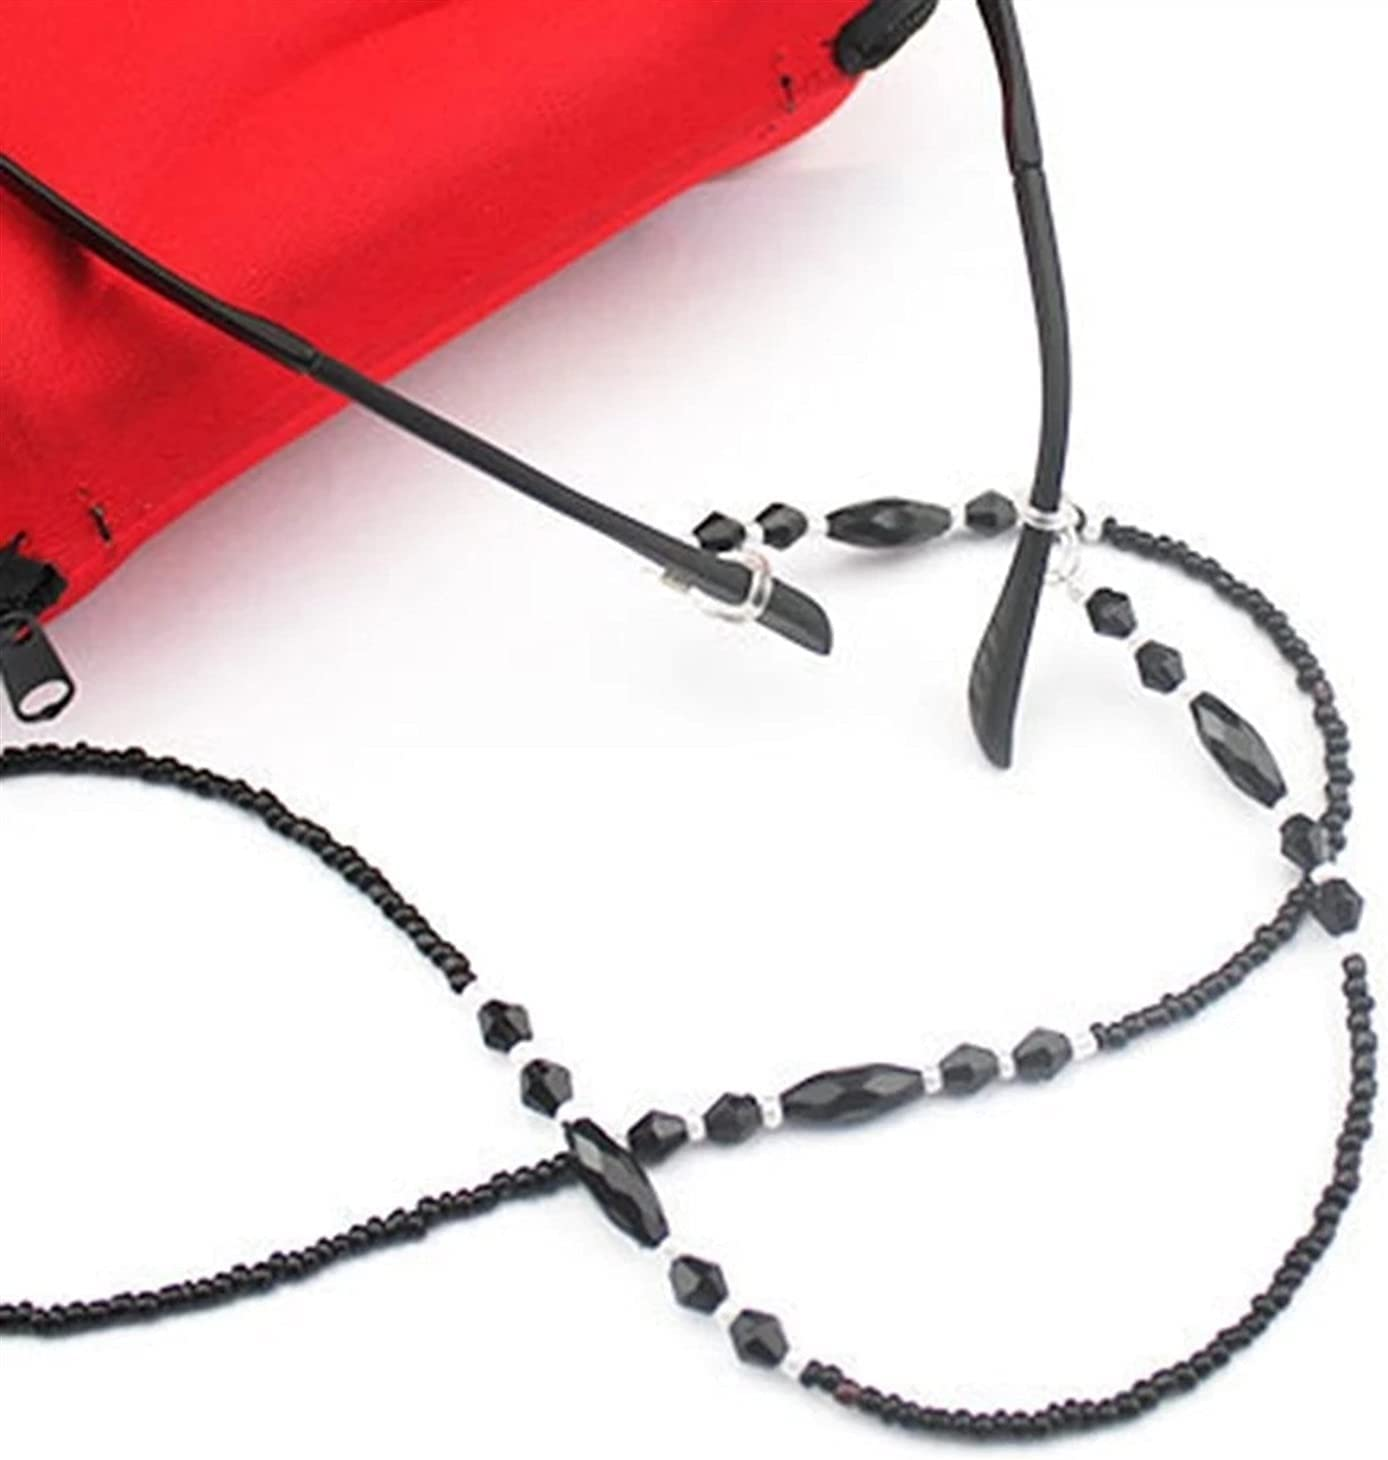 GWSD Fashion Eyeglasses Chains Rope Black Acrylic Beads Chains Anti-Slip Eye-wear Cord Holder Neck Strap Reading Glasses Rope (Color : Black)